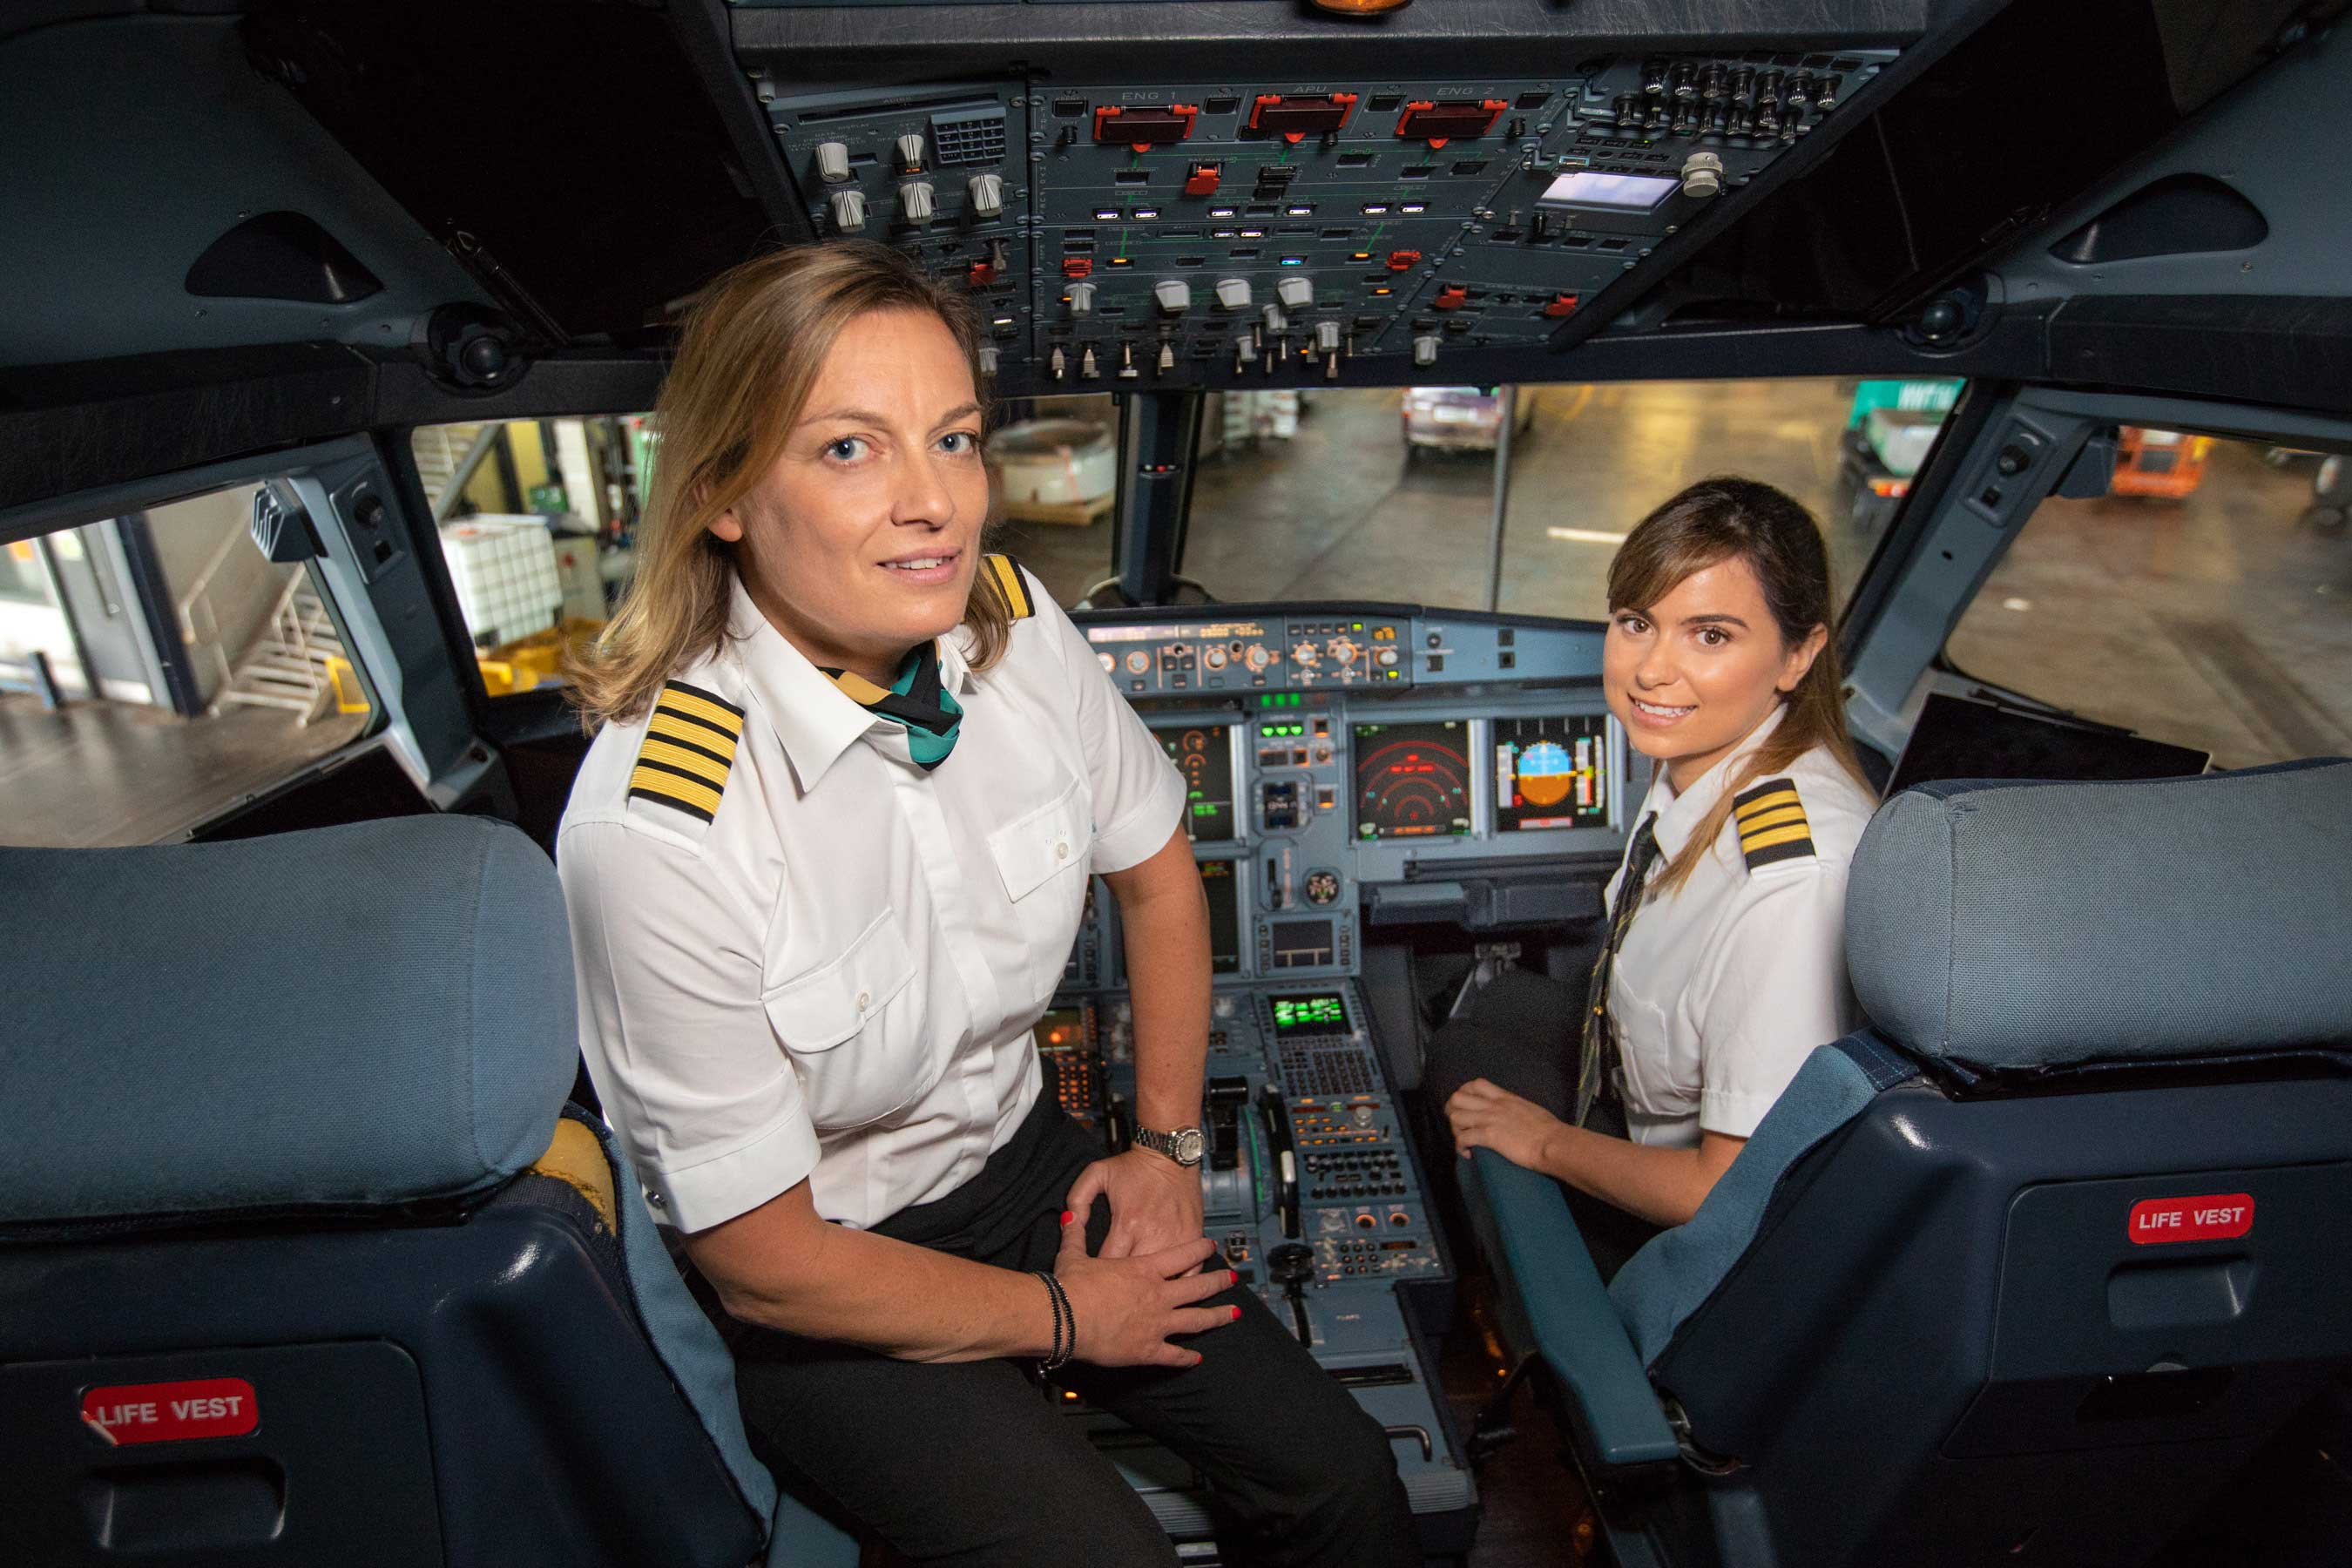 Aer Lingus female pilots